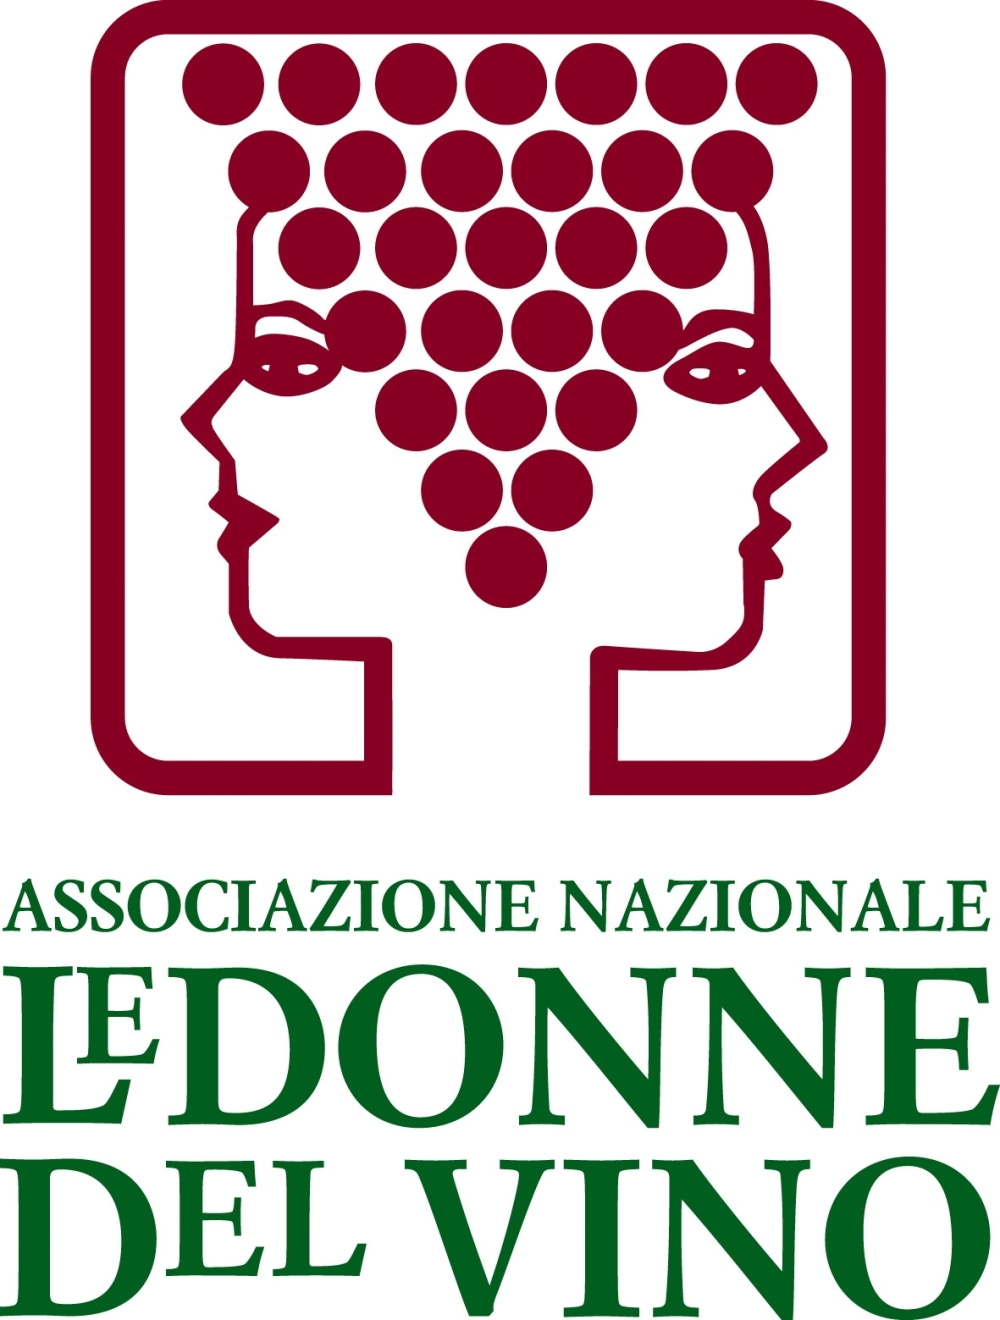 logo classico jpeg.jpg